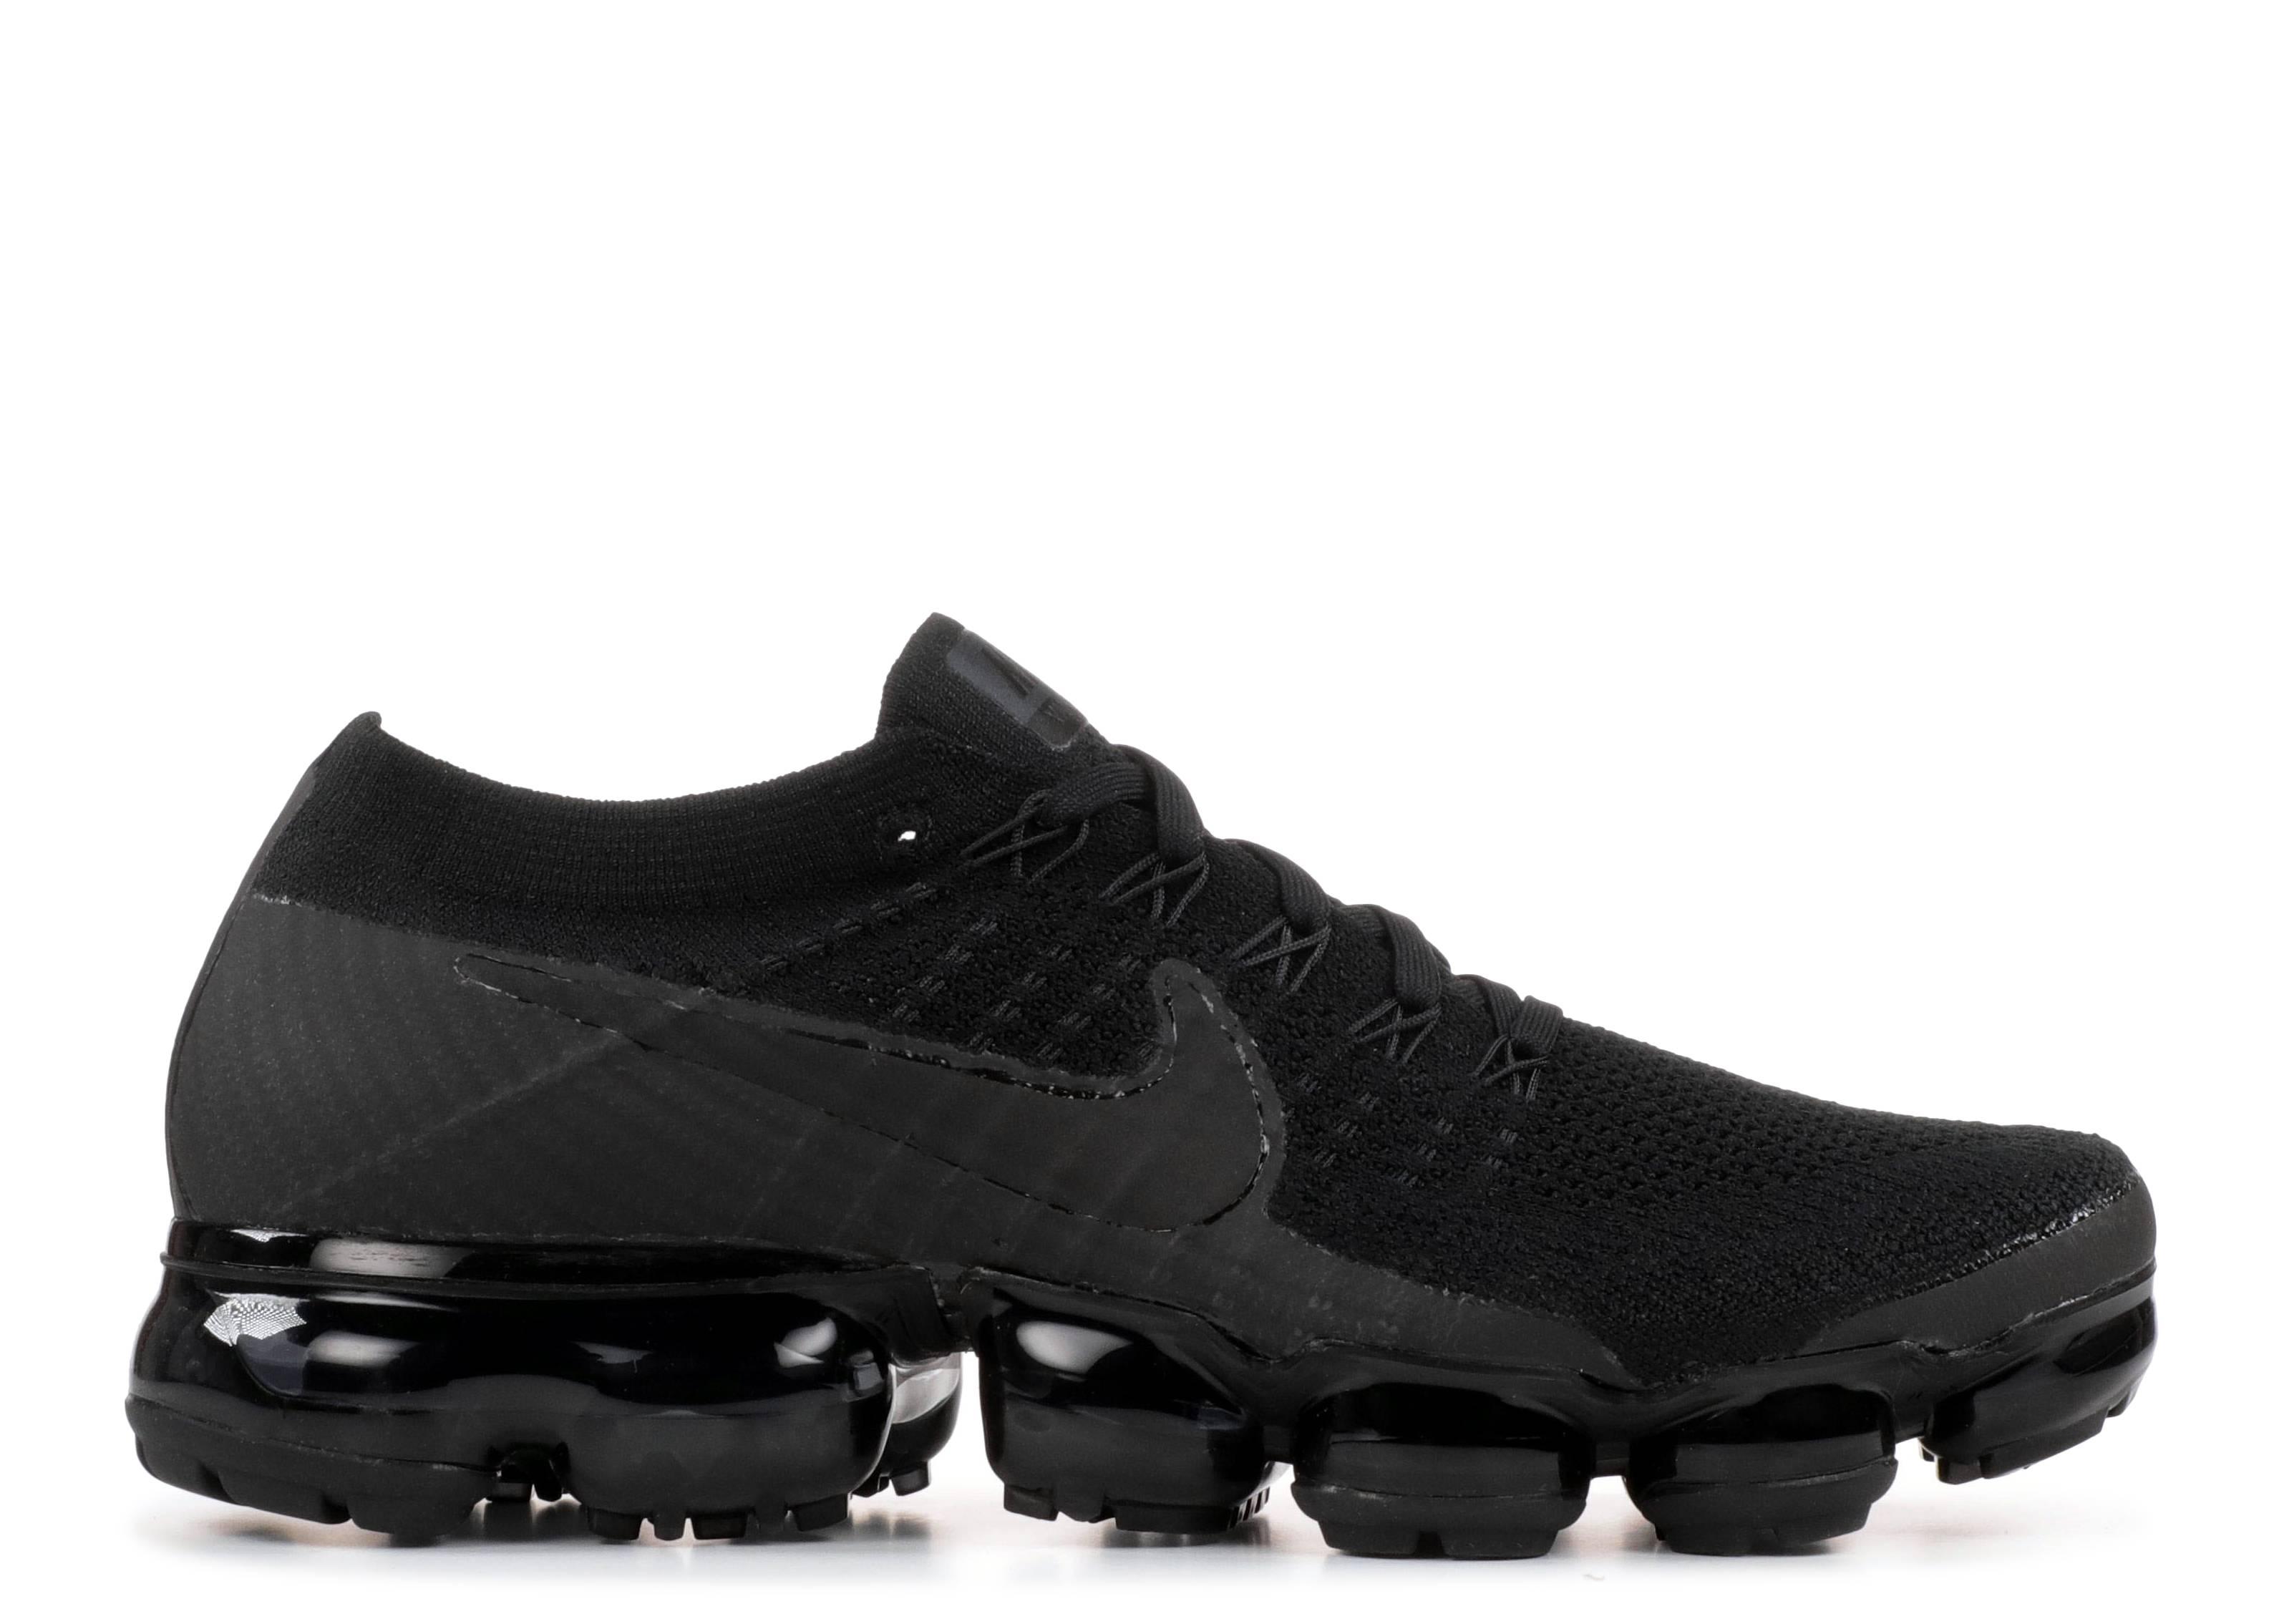 37b7eb51ab6ca5 Wmns Nike Air Vapormax Flyknit - Nike - 849557 011 - black black-anthracite-white